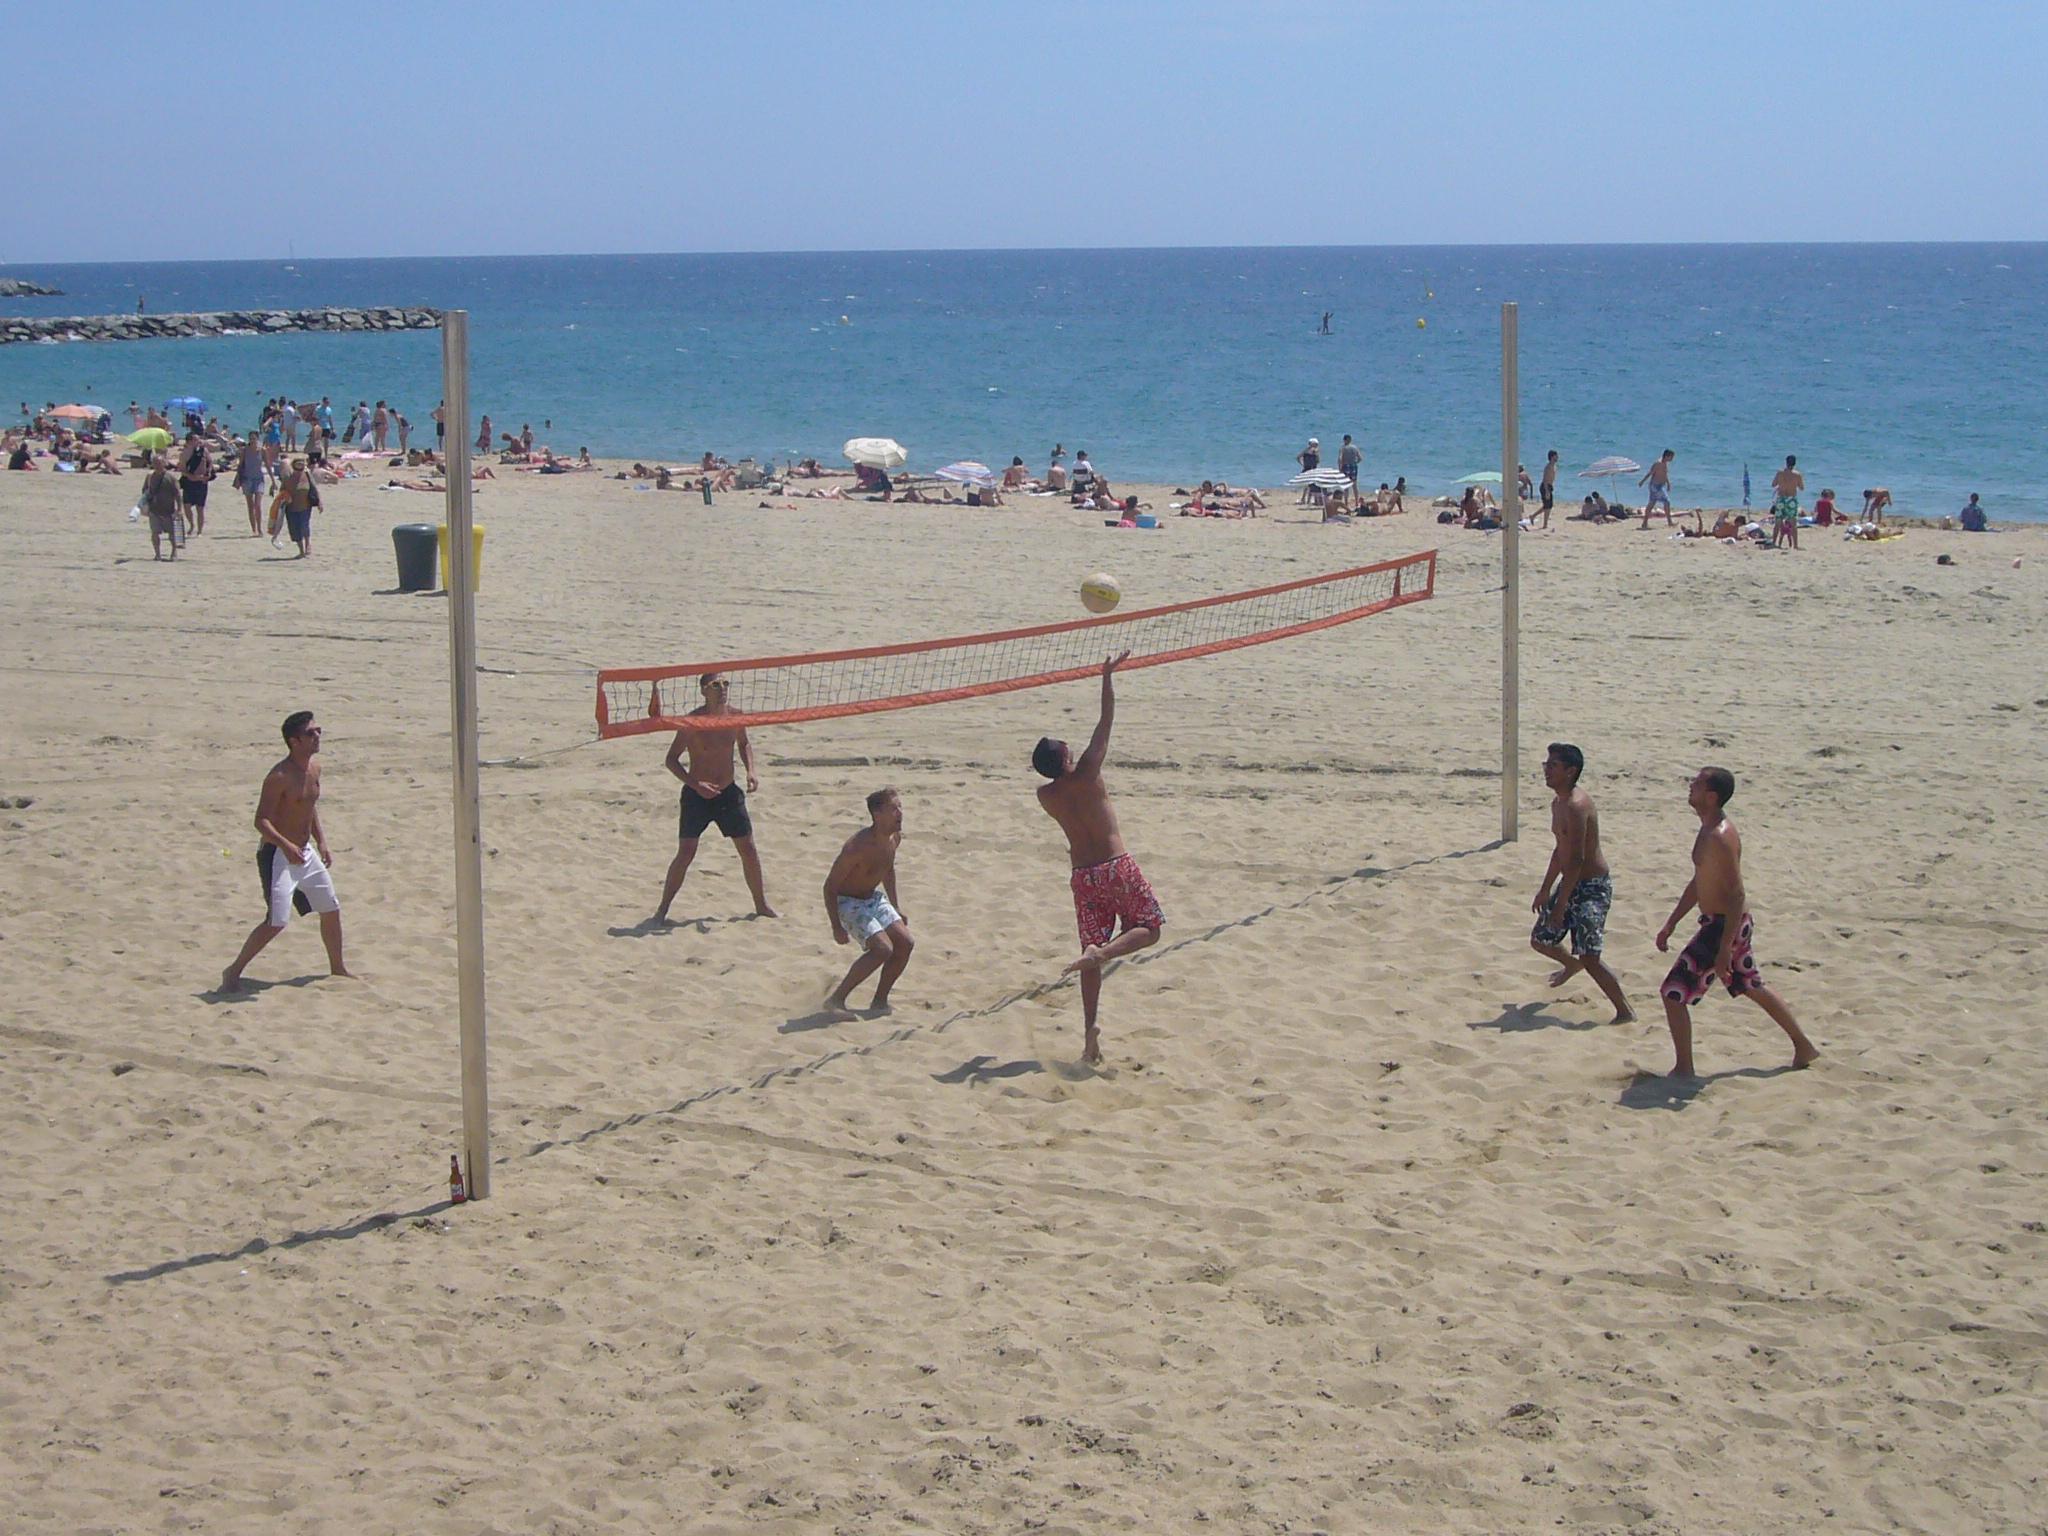 File:Volleyball at Platja de la Nova Mar Bella.JPG - Wikimedia Commons